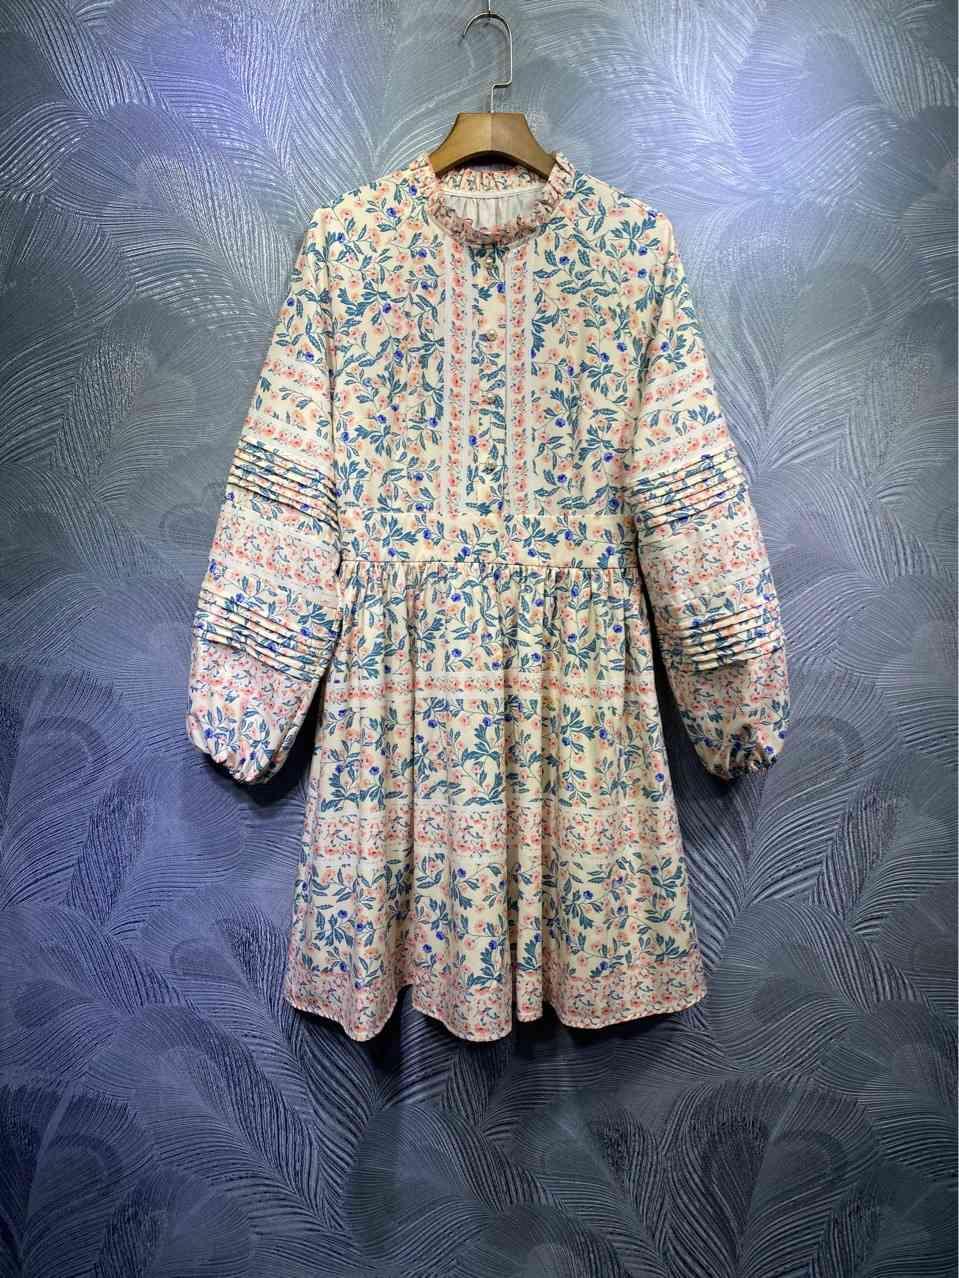 ZIM dress Australia spring high-quality stand-up collar printing stitching holiday